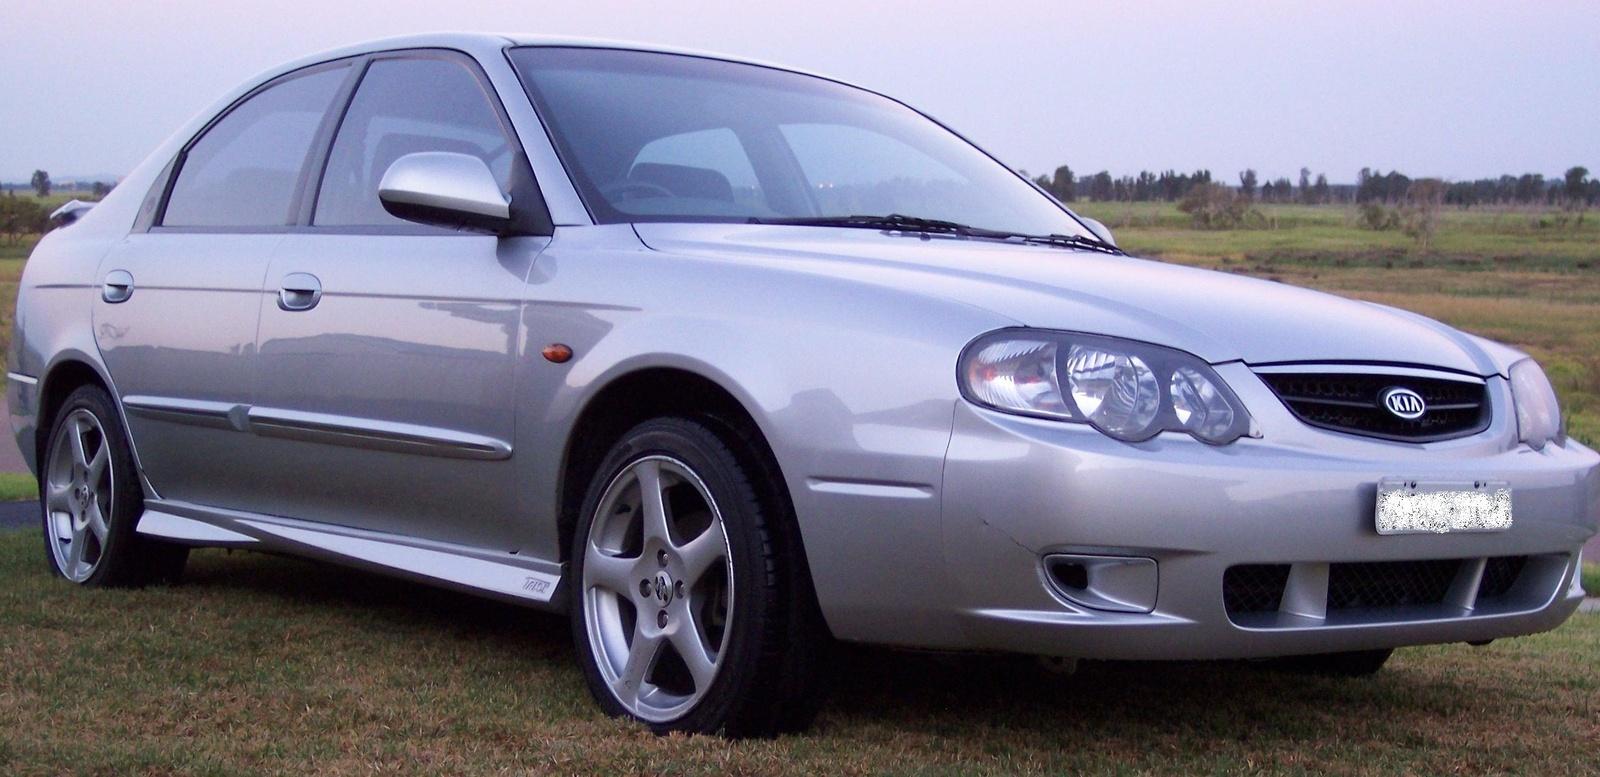 Autos World For All Kia 2001